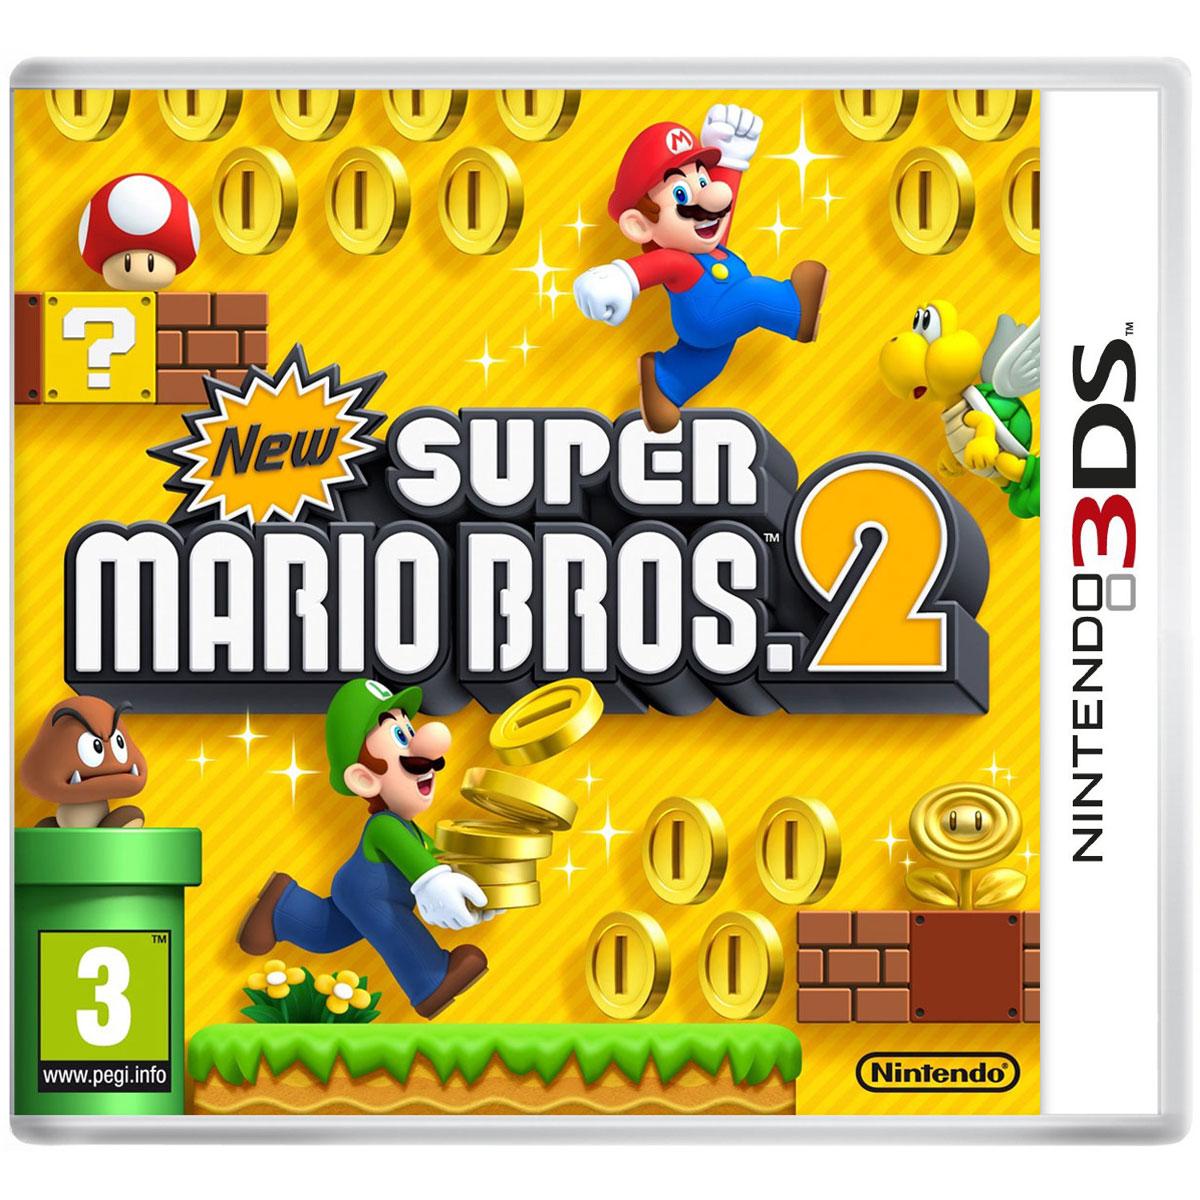 New Super Mario Bros 2 (Nintendo 3DS/2DS) - Jeux Nintendo ...